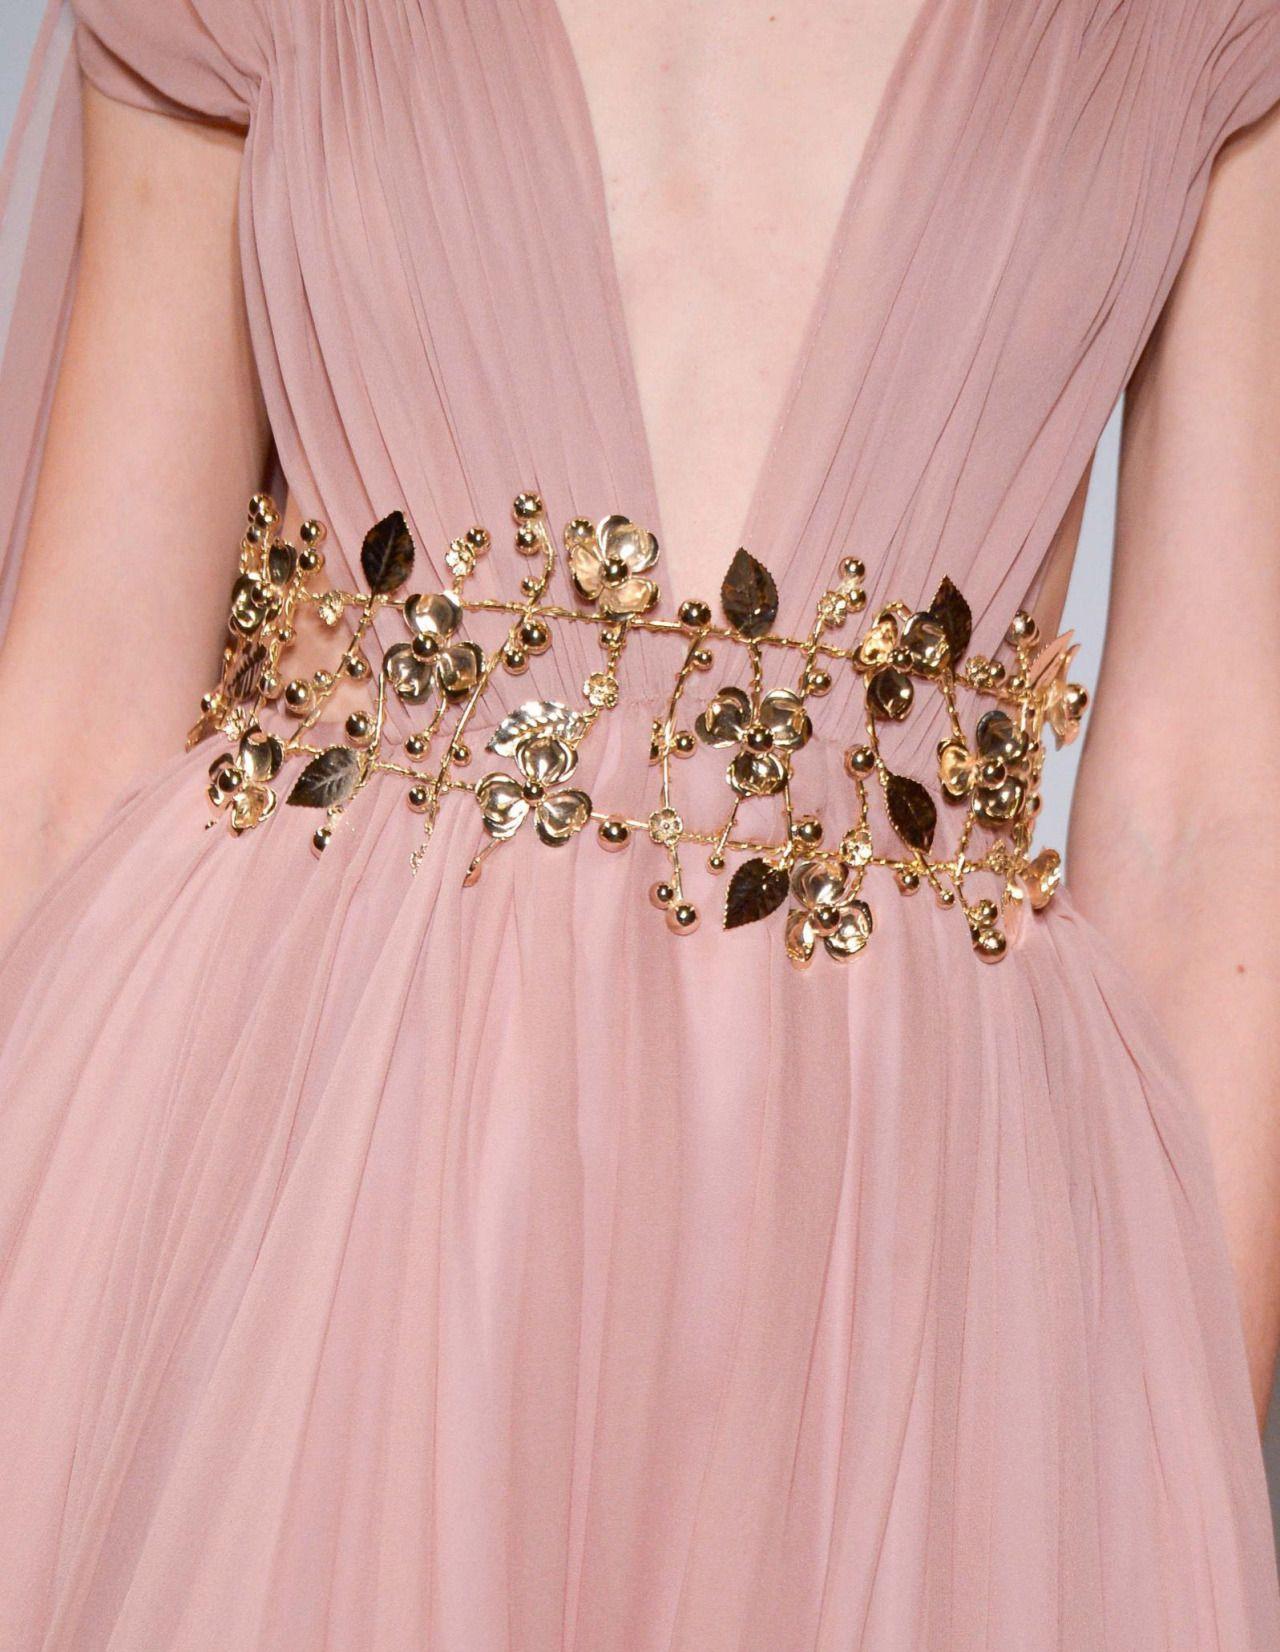 agameofclothes: What Margaery would wear, Dany Atrache | Vestidos de ...